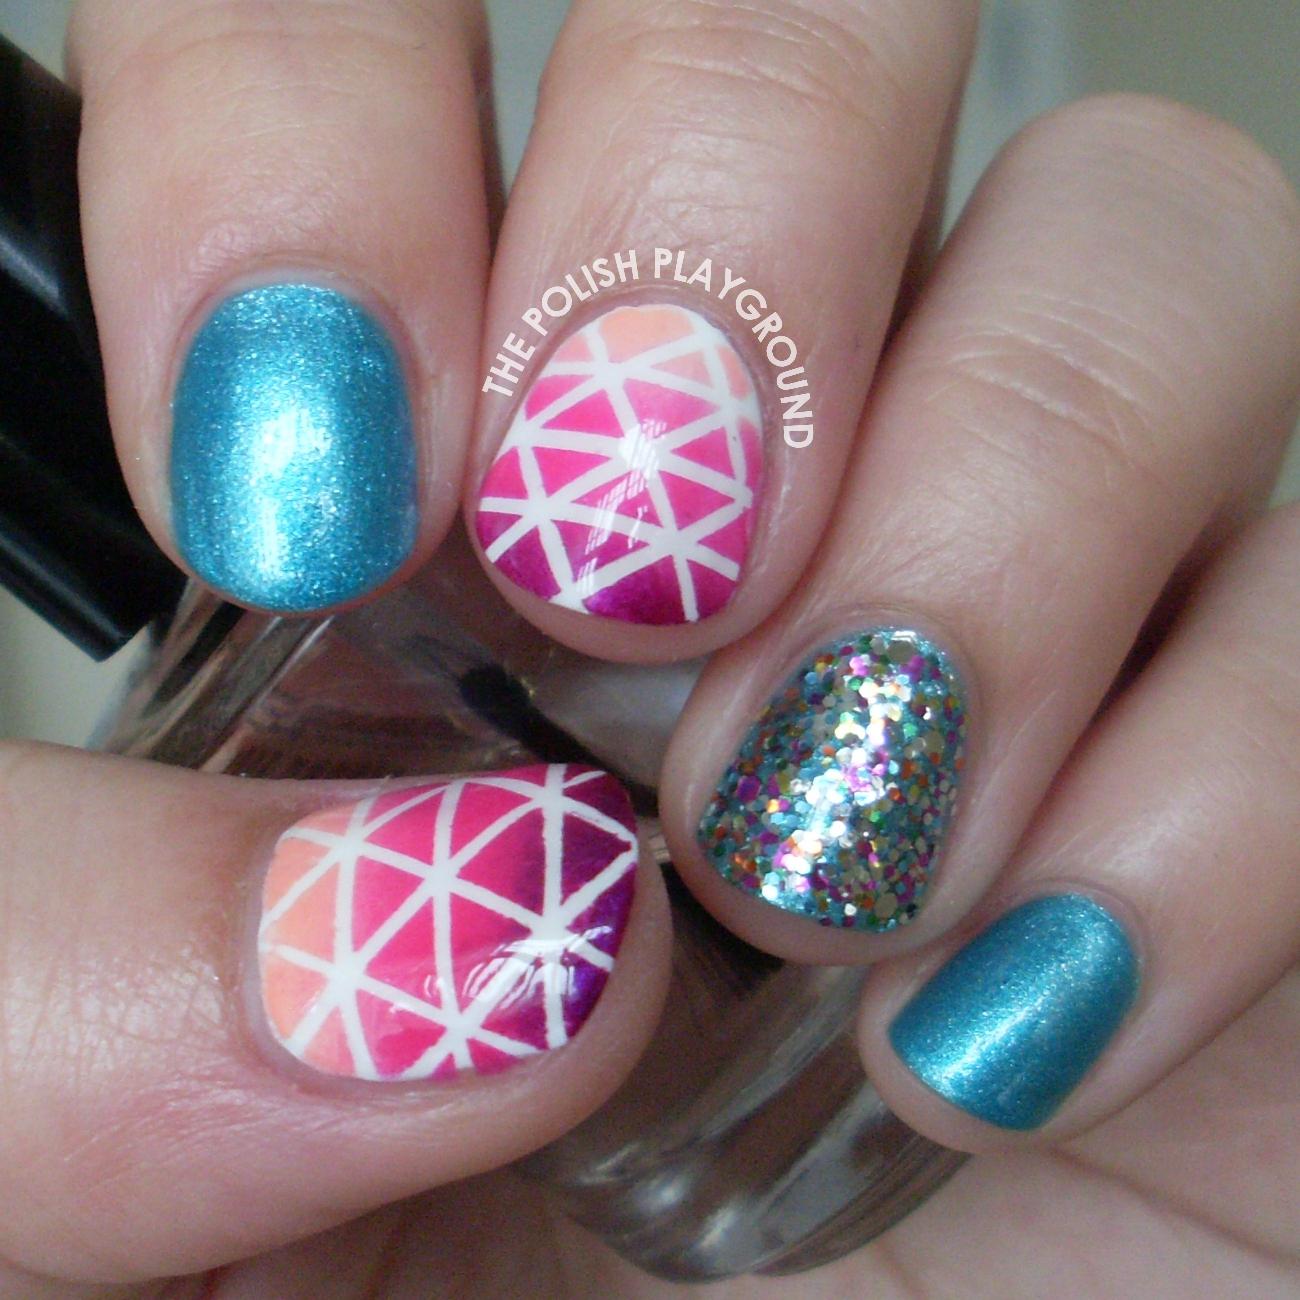 The Polish Playground: Geometric Nails